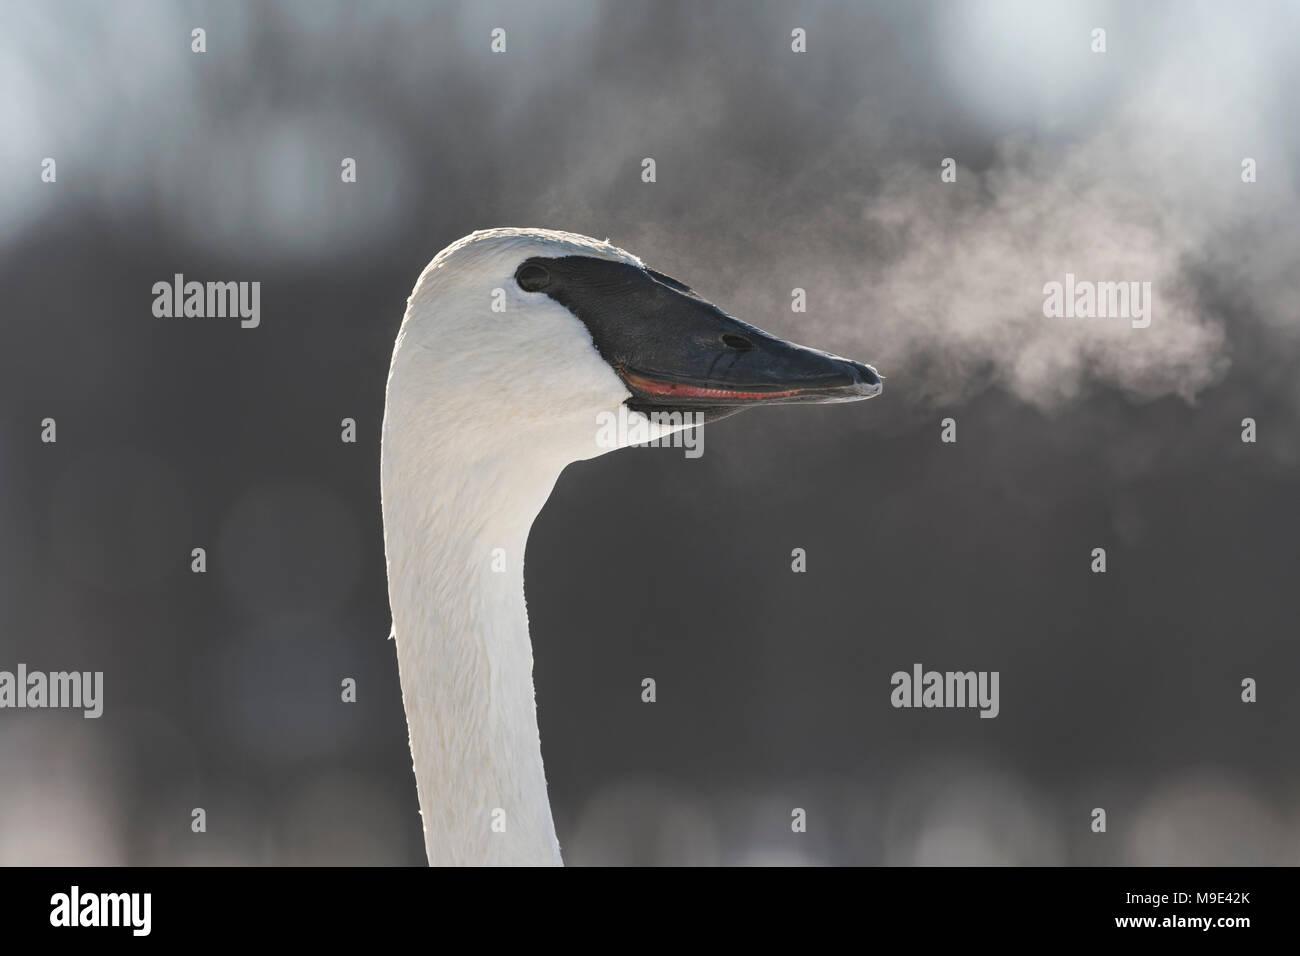 Trompeter Schwan (Cygnus buccinator) ausatmen, sichtbaren Atem, WI, USA, Anfang Januar, von Dominique Braud/Dembinsky Foto Assoc Stockbild